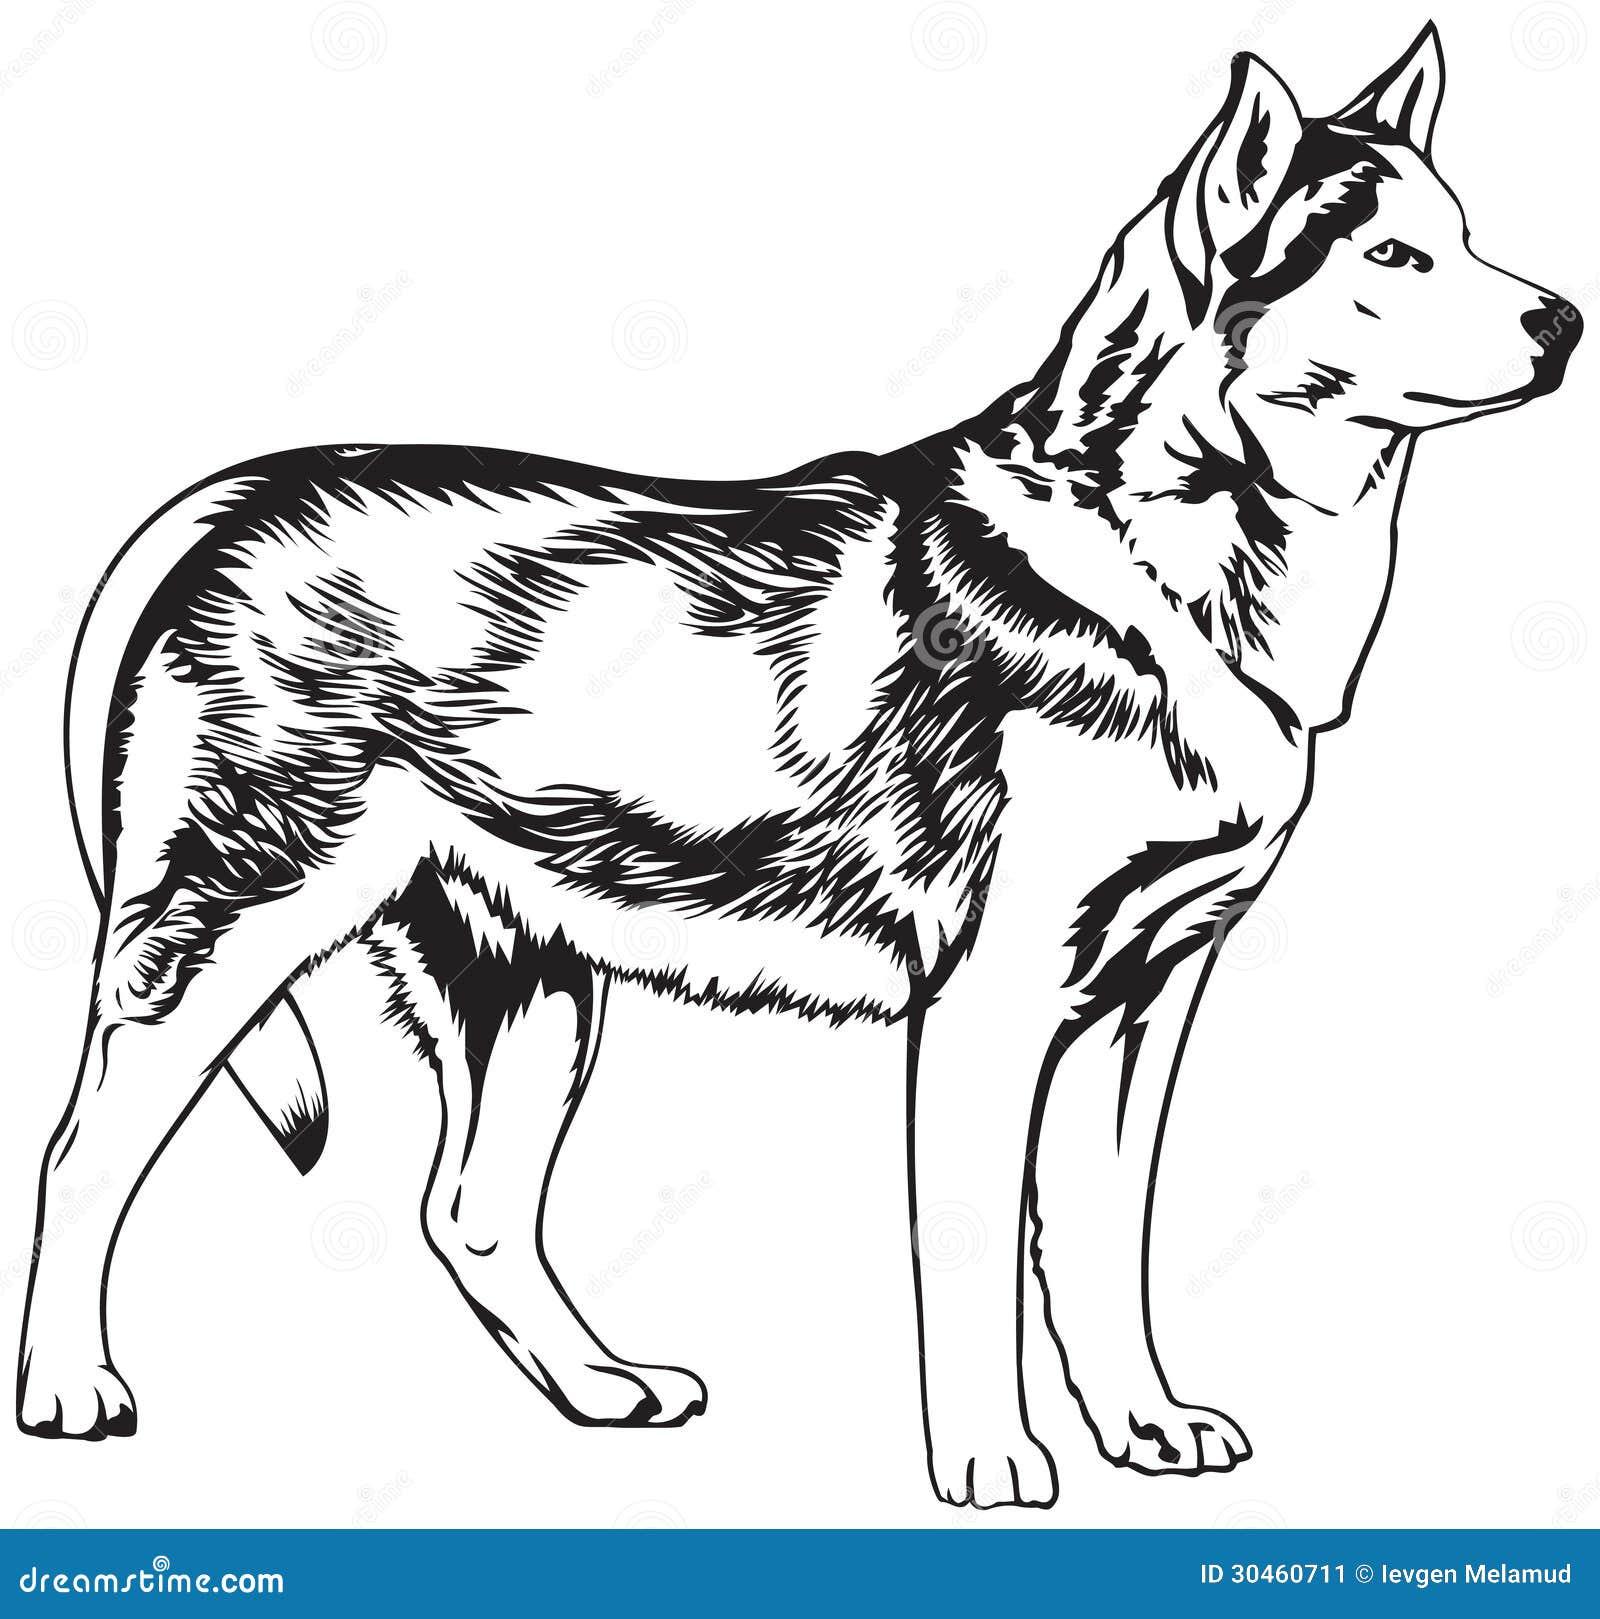 husky dog breed vector illustration stock vector illustration of states  arctic 30460711 dog sledding clipart dog sled clip art free